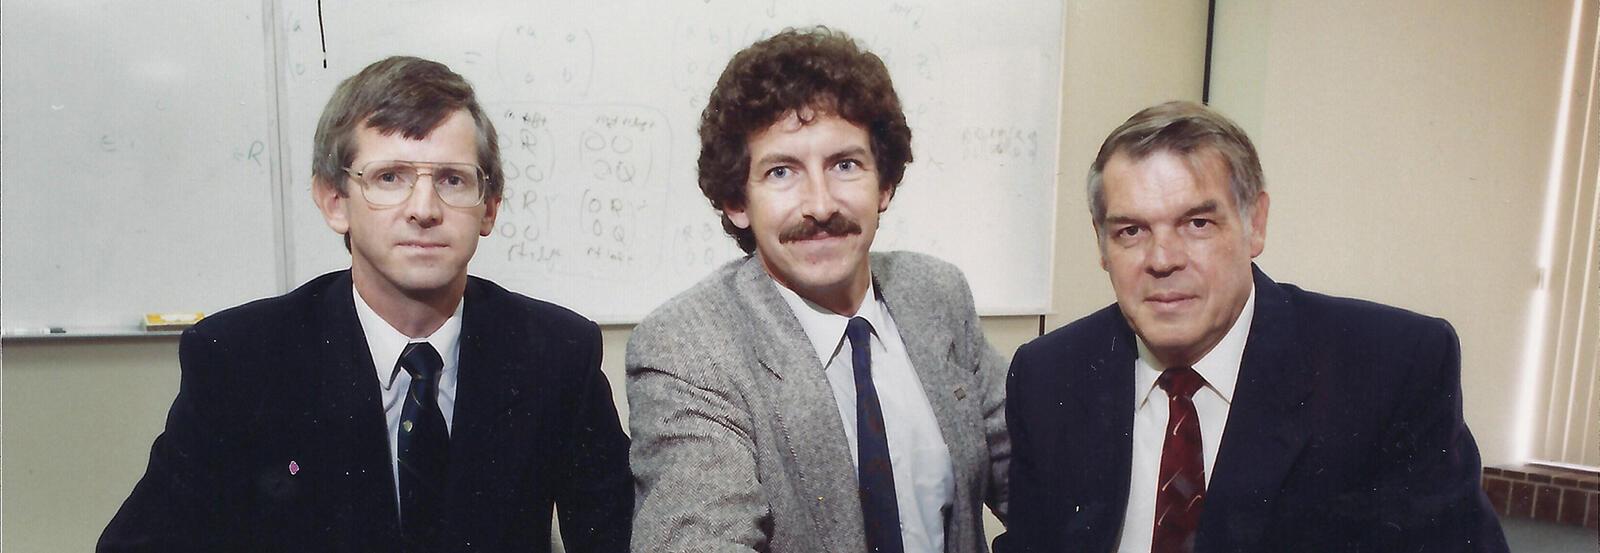 Scott, Gord and Ron